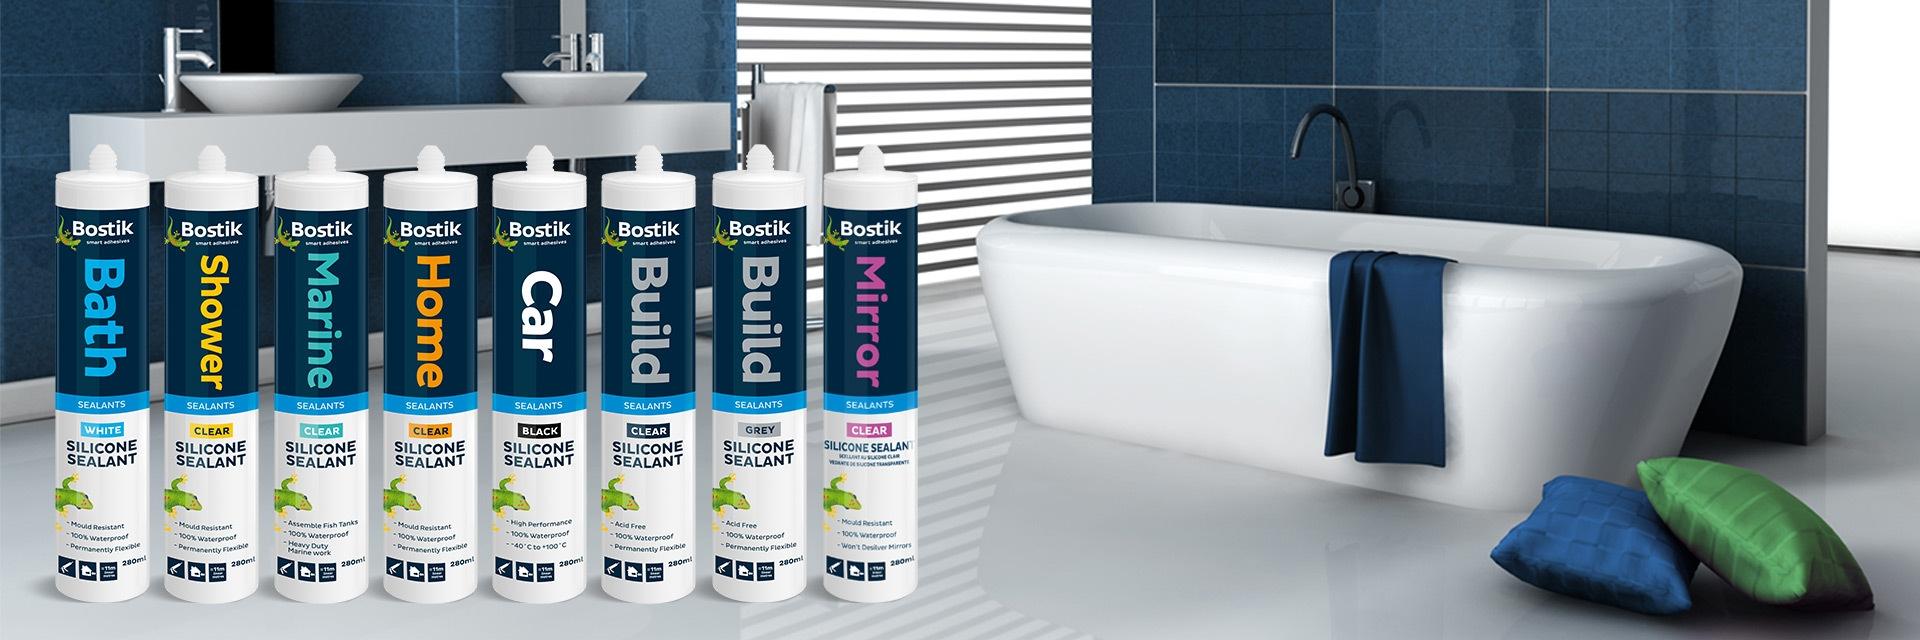 Bostik DIY South Africa Sealants range banner